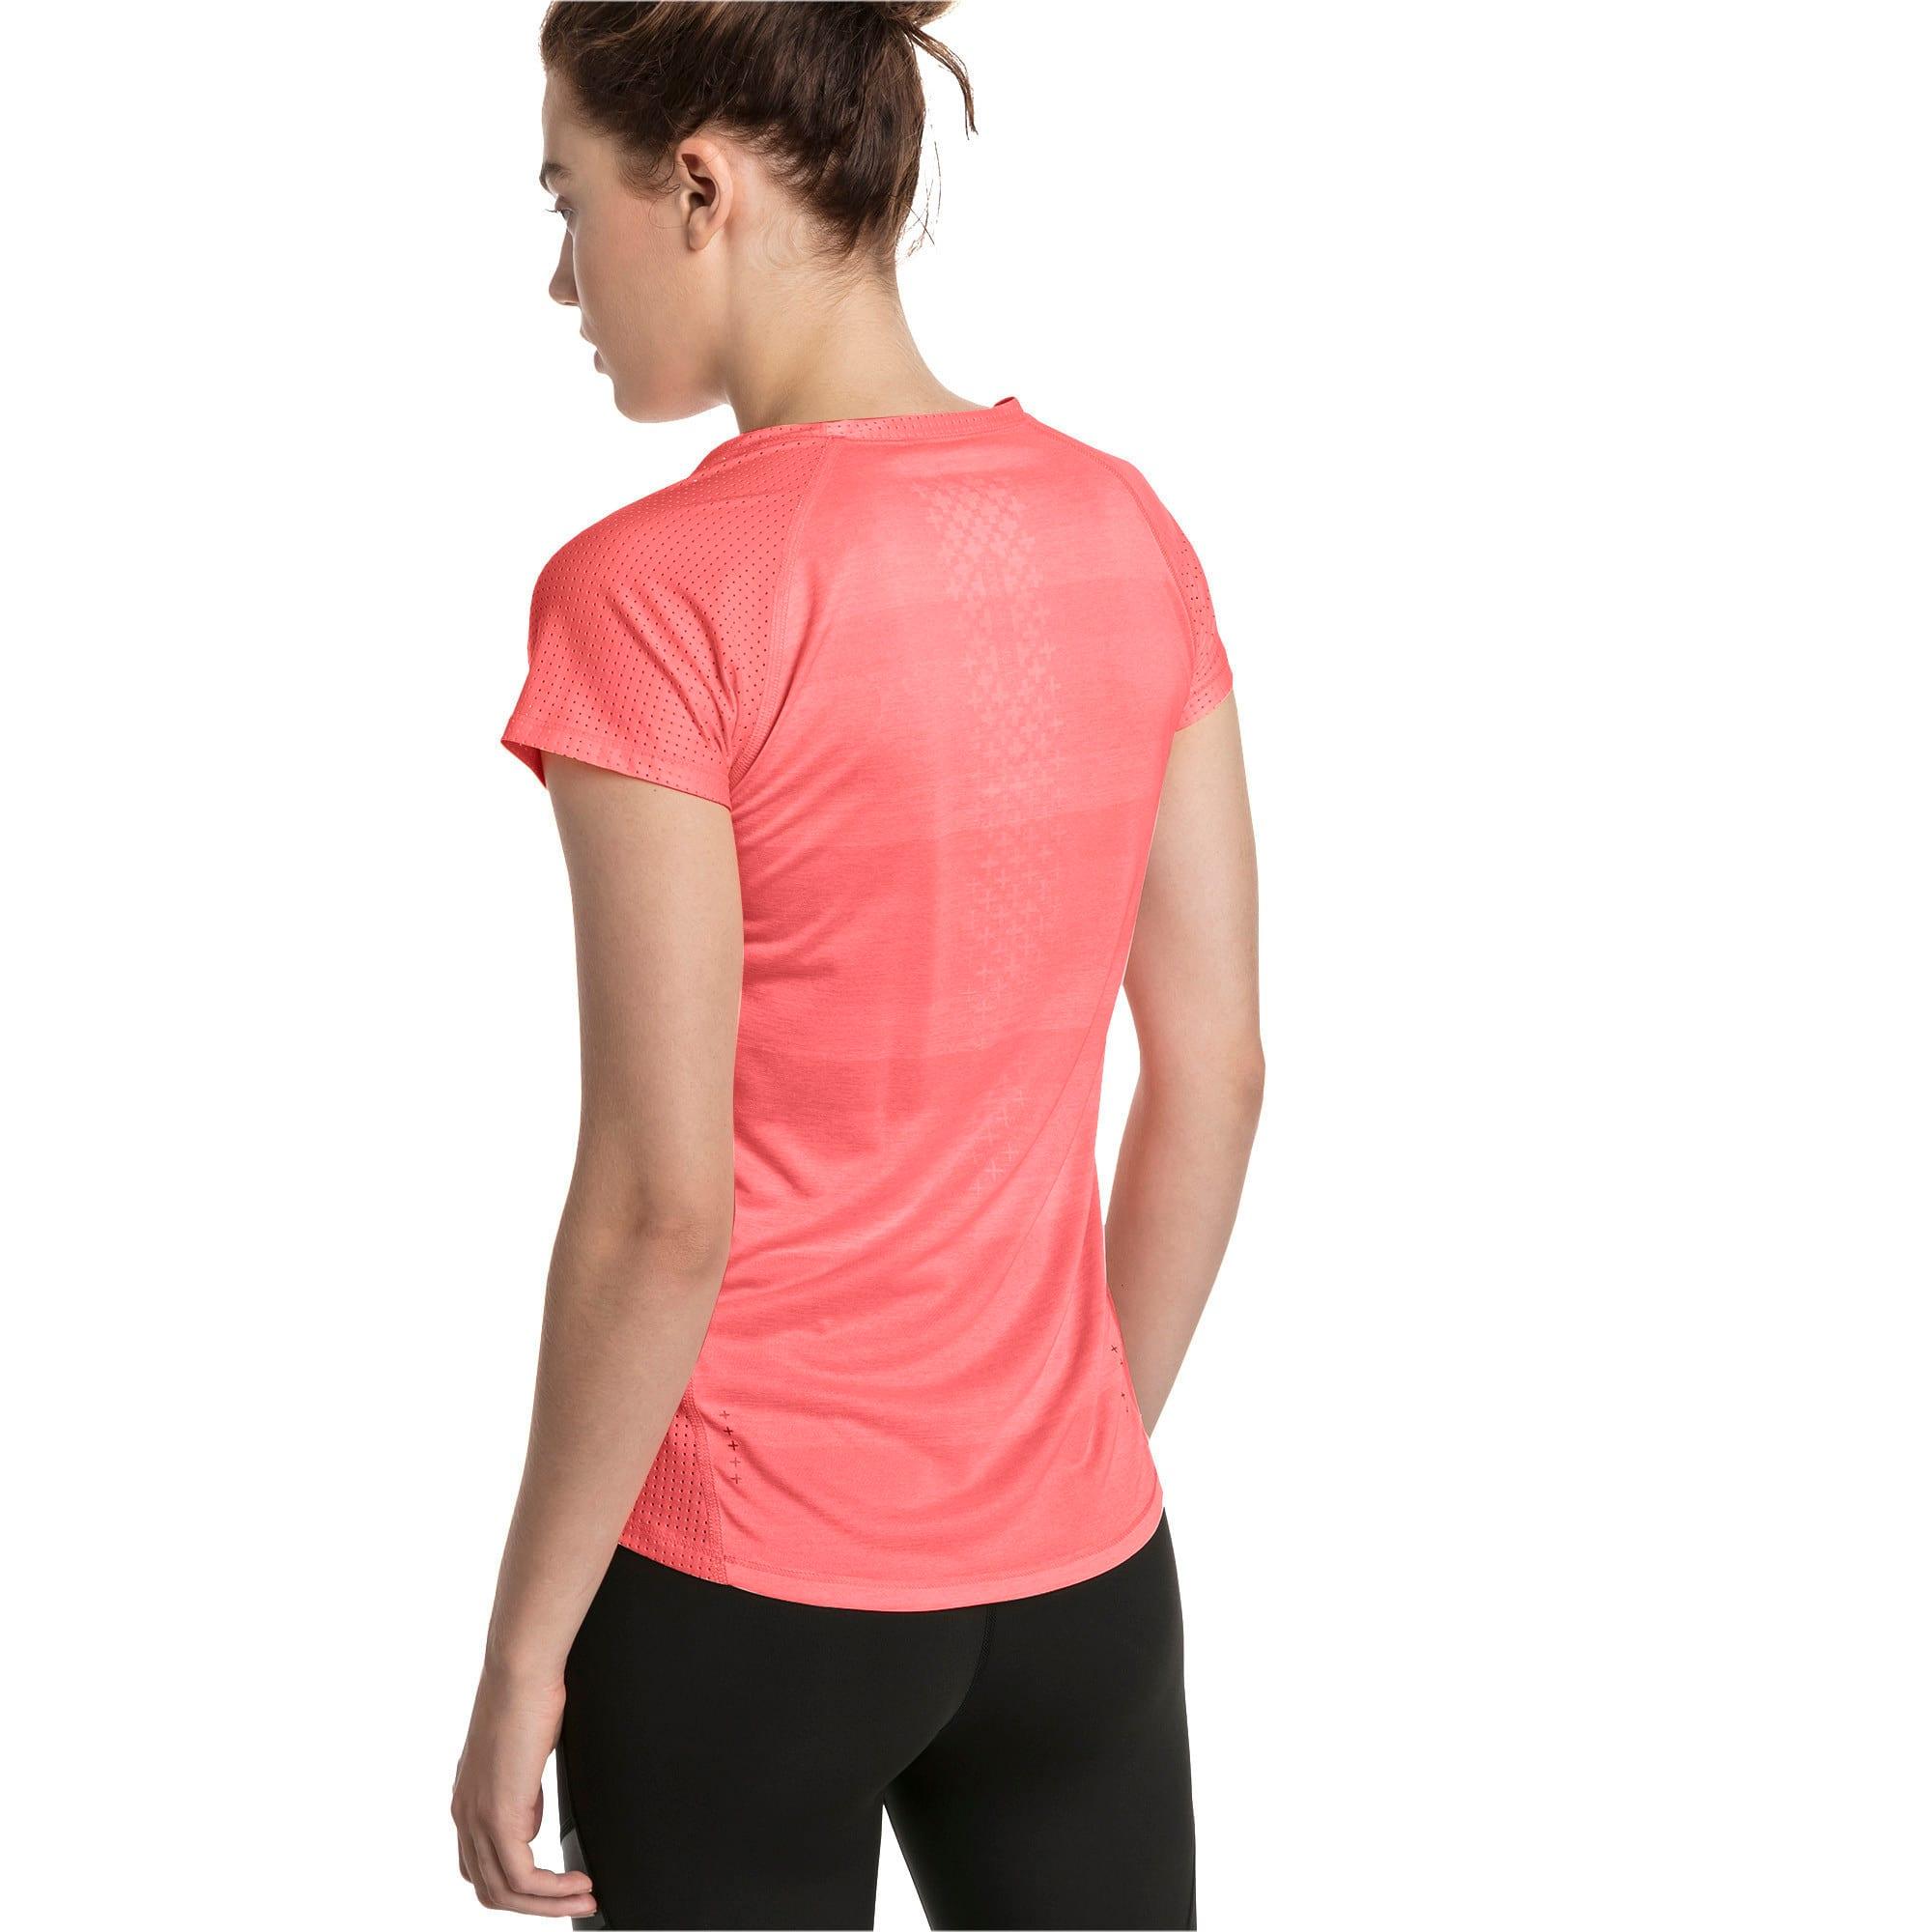 Thumbnail 2 of Thermo-R+ Short Sleeve Women's Running Tee, Bright Peach Heather, medium-IND